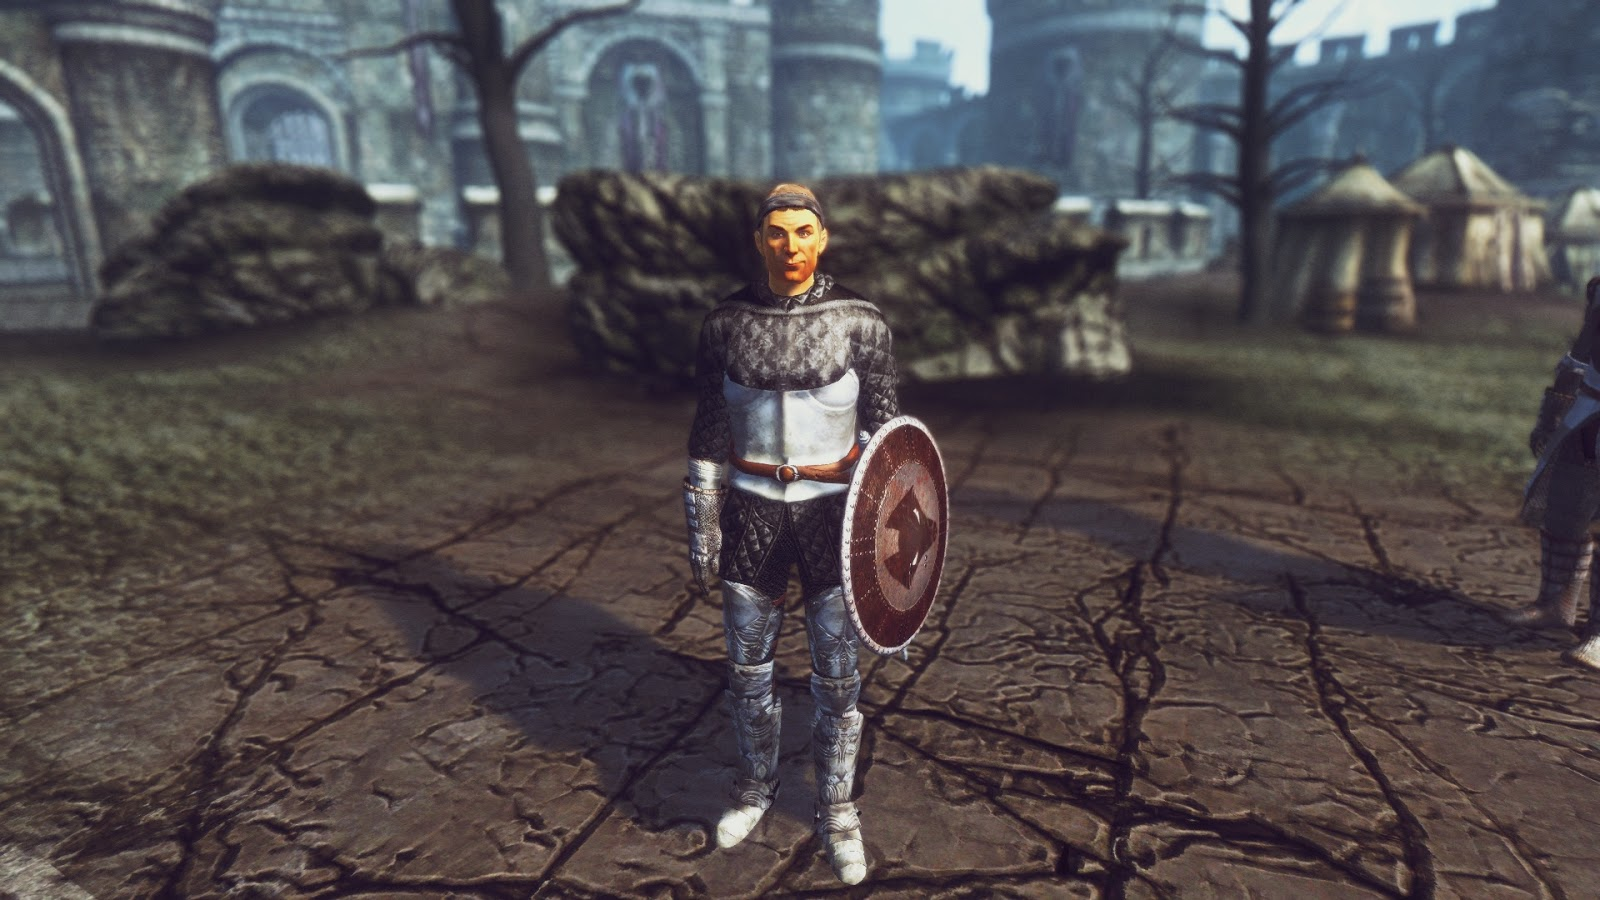 Amateur Mods by Zensalin / Mixxa77: Local Guards Features - Kvatch